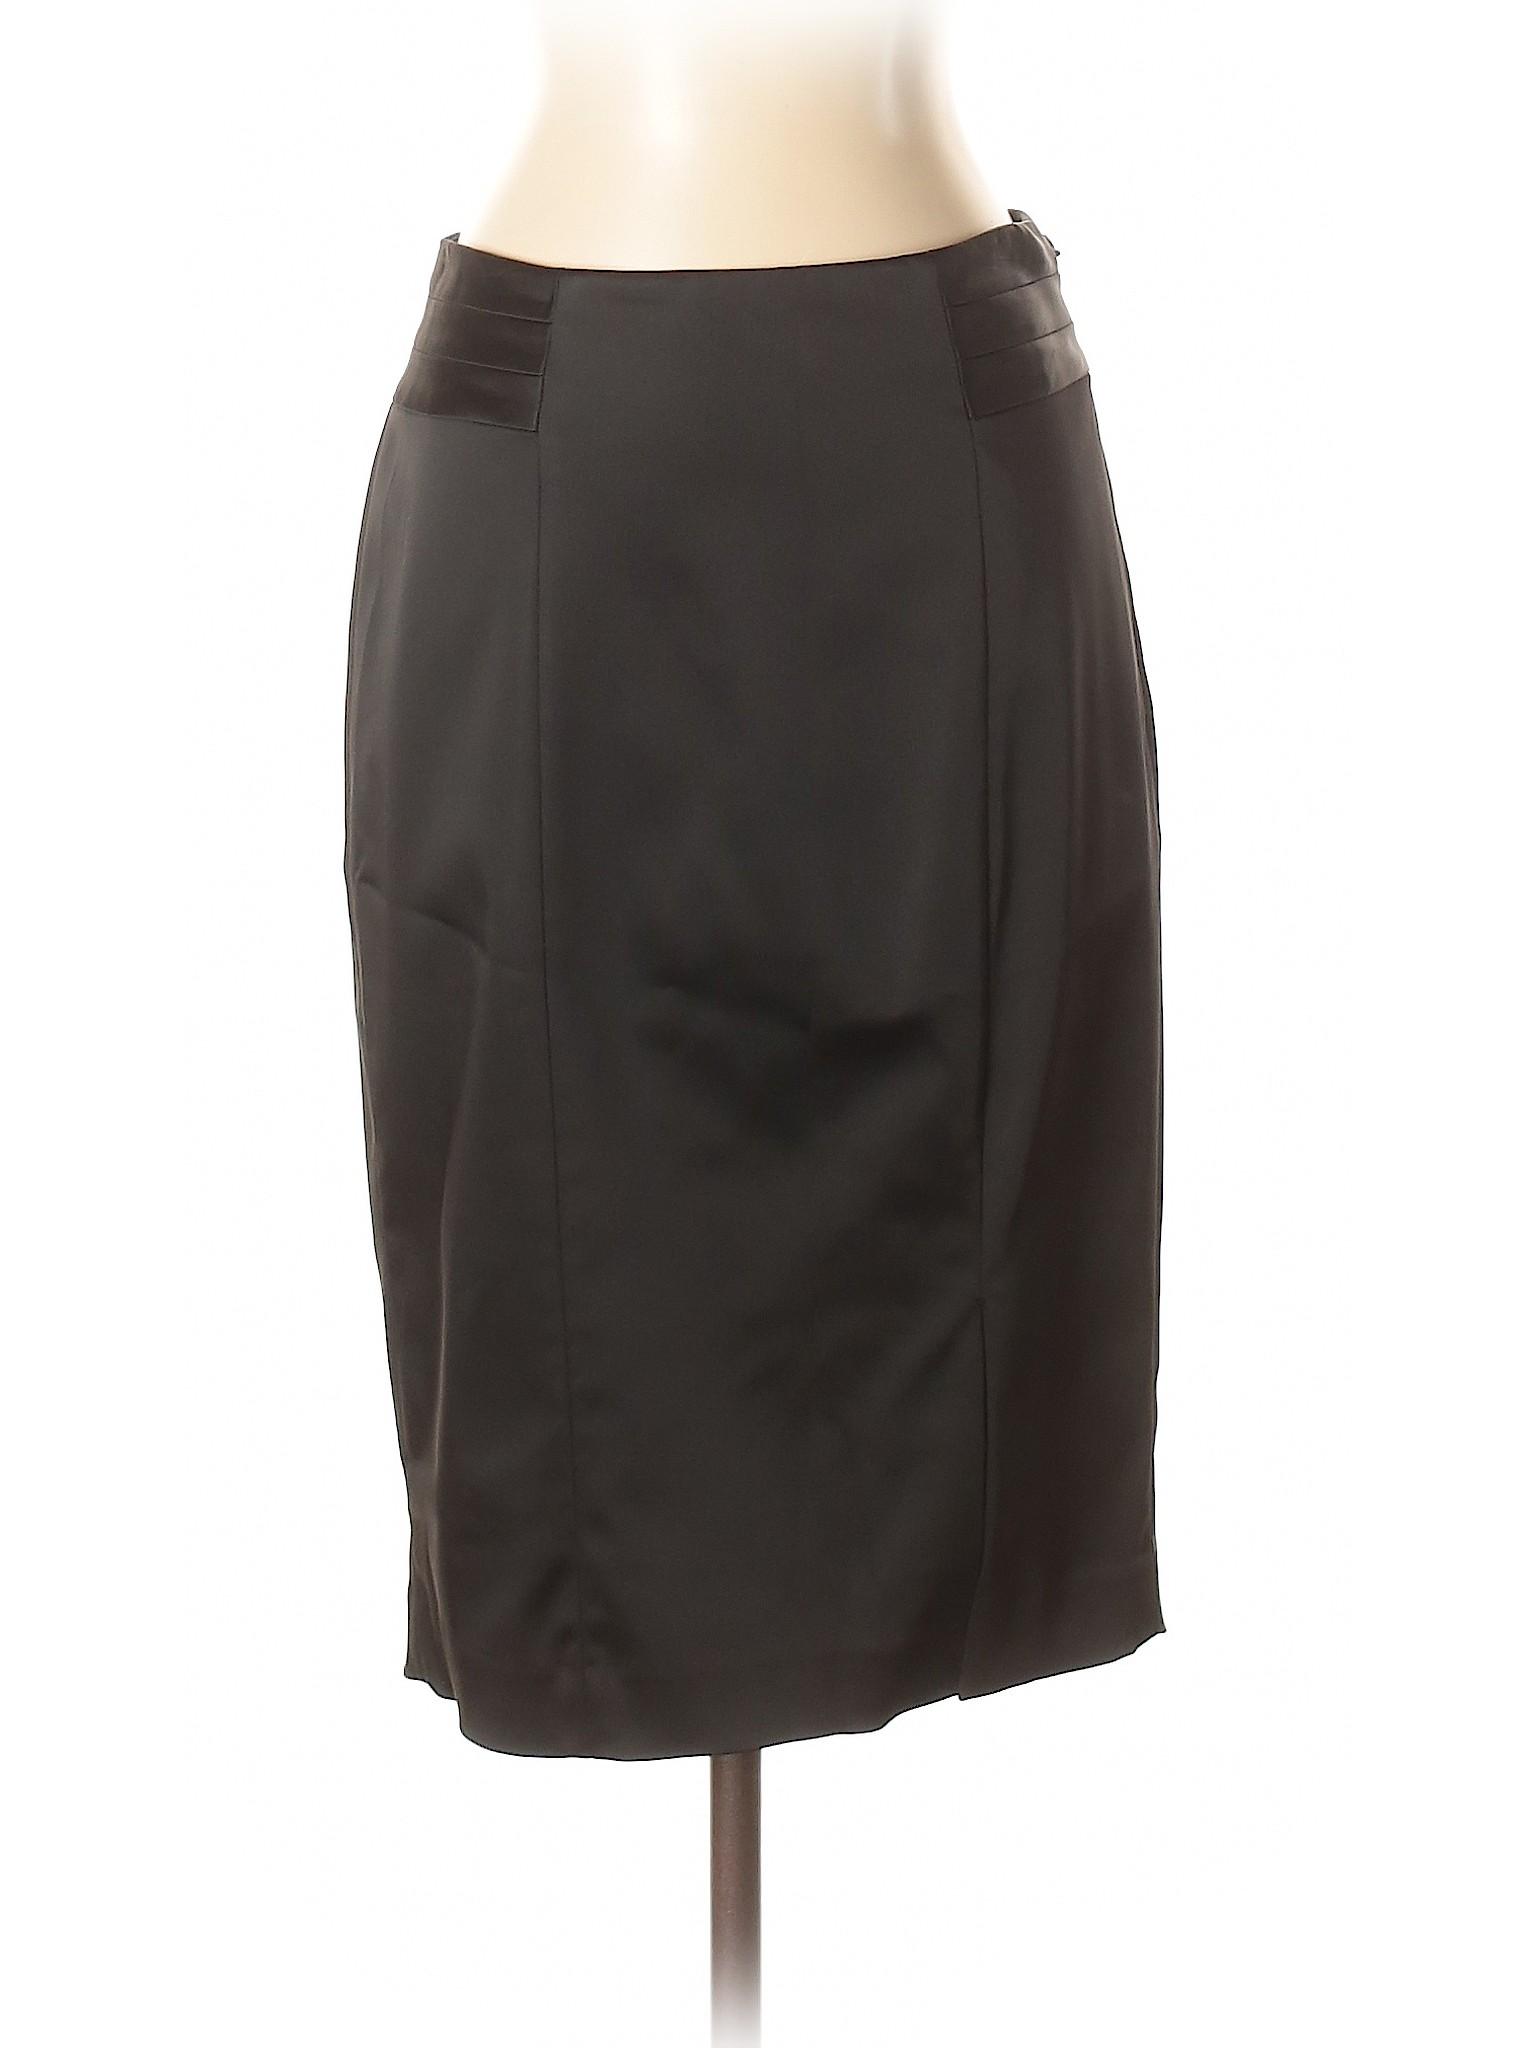 White House Skirt winter Leisure Casual Market Black 5EARx4wq